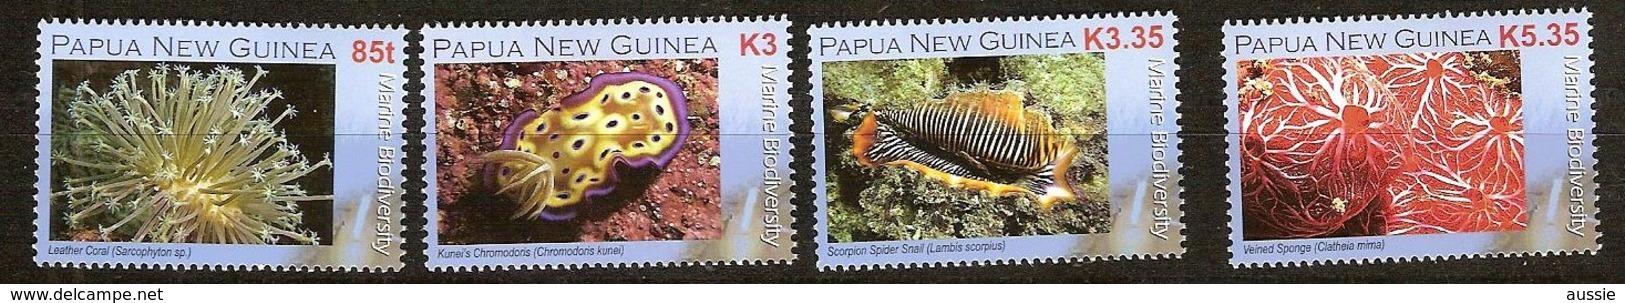 Papouasie Papua New Guinea 2008 Yvert 1203-1206 *** MNH Cote 12,15 Euro Faune Marine - Papúa Nueva Guinea